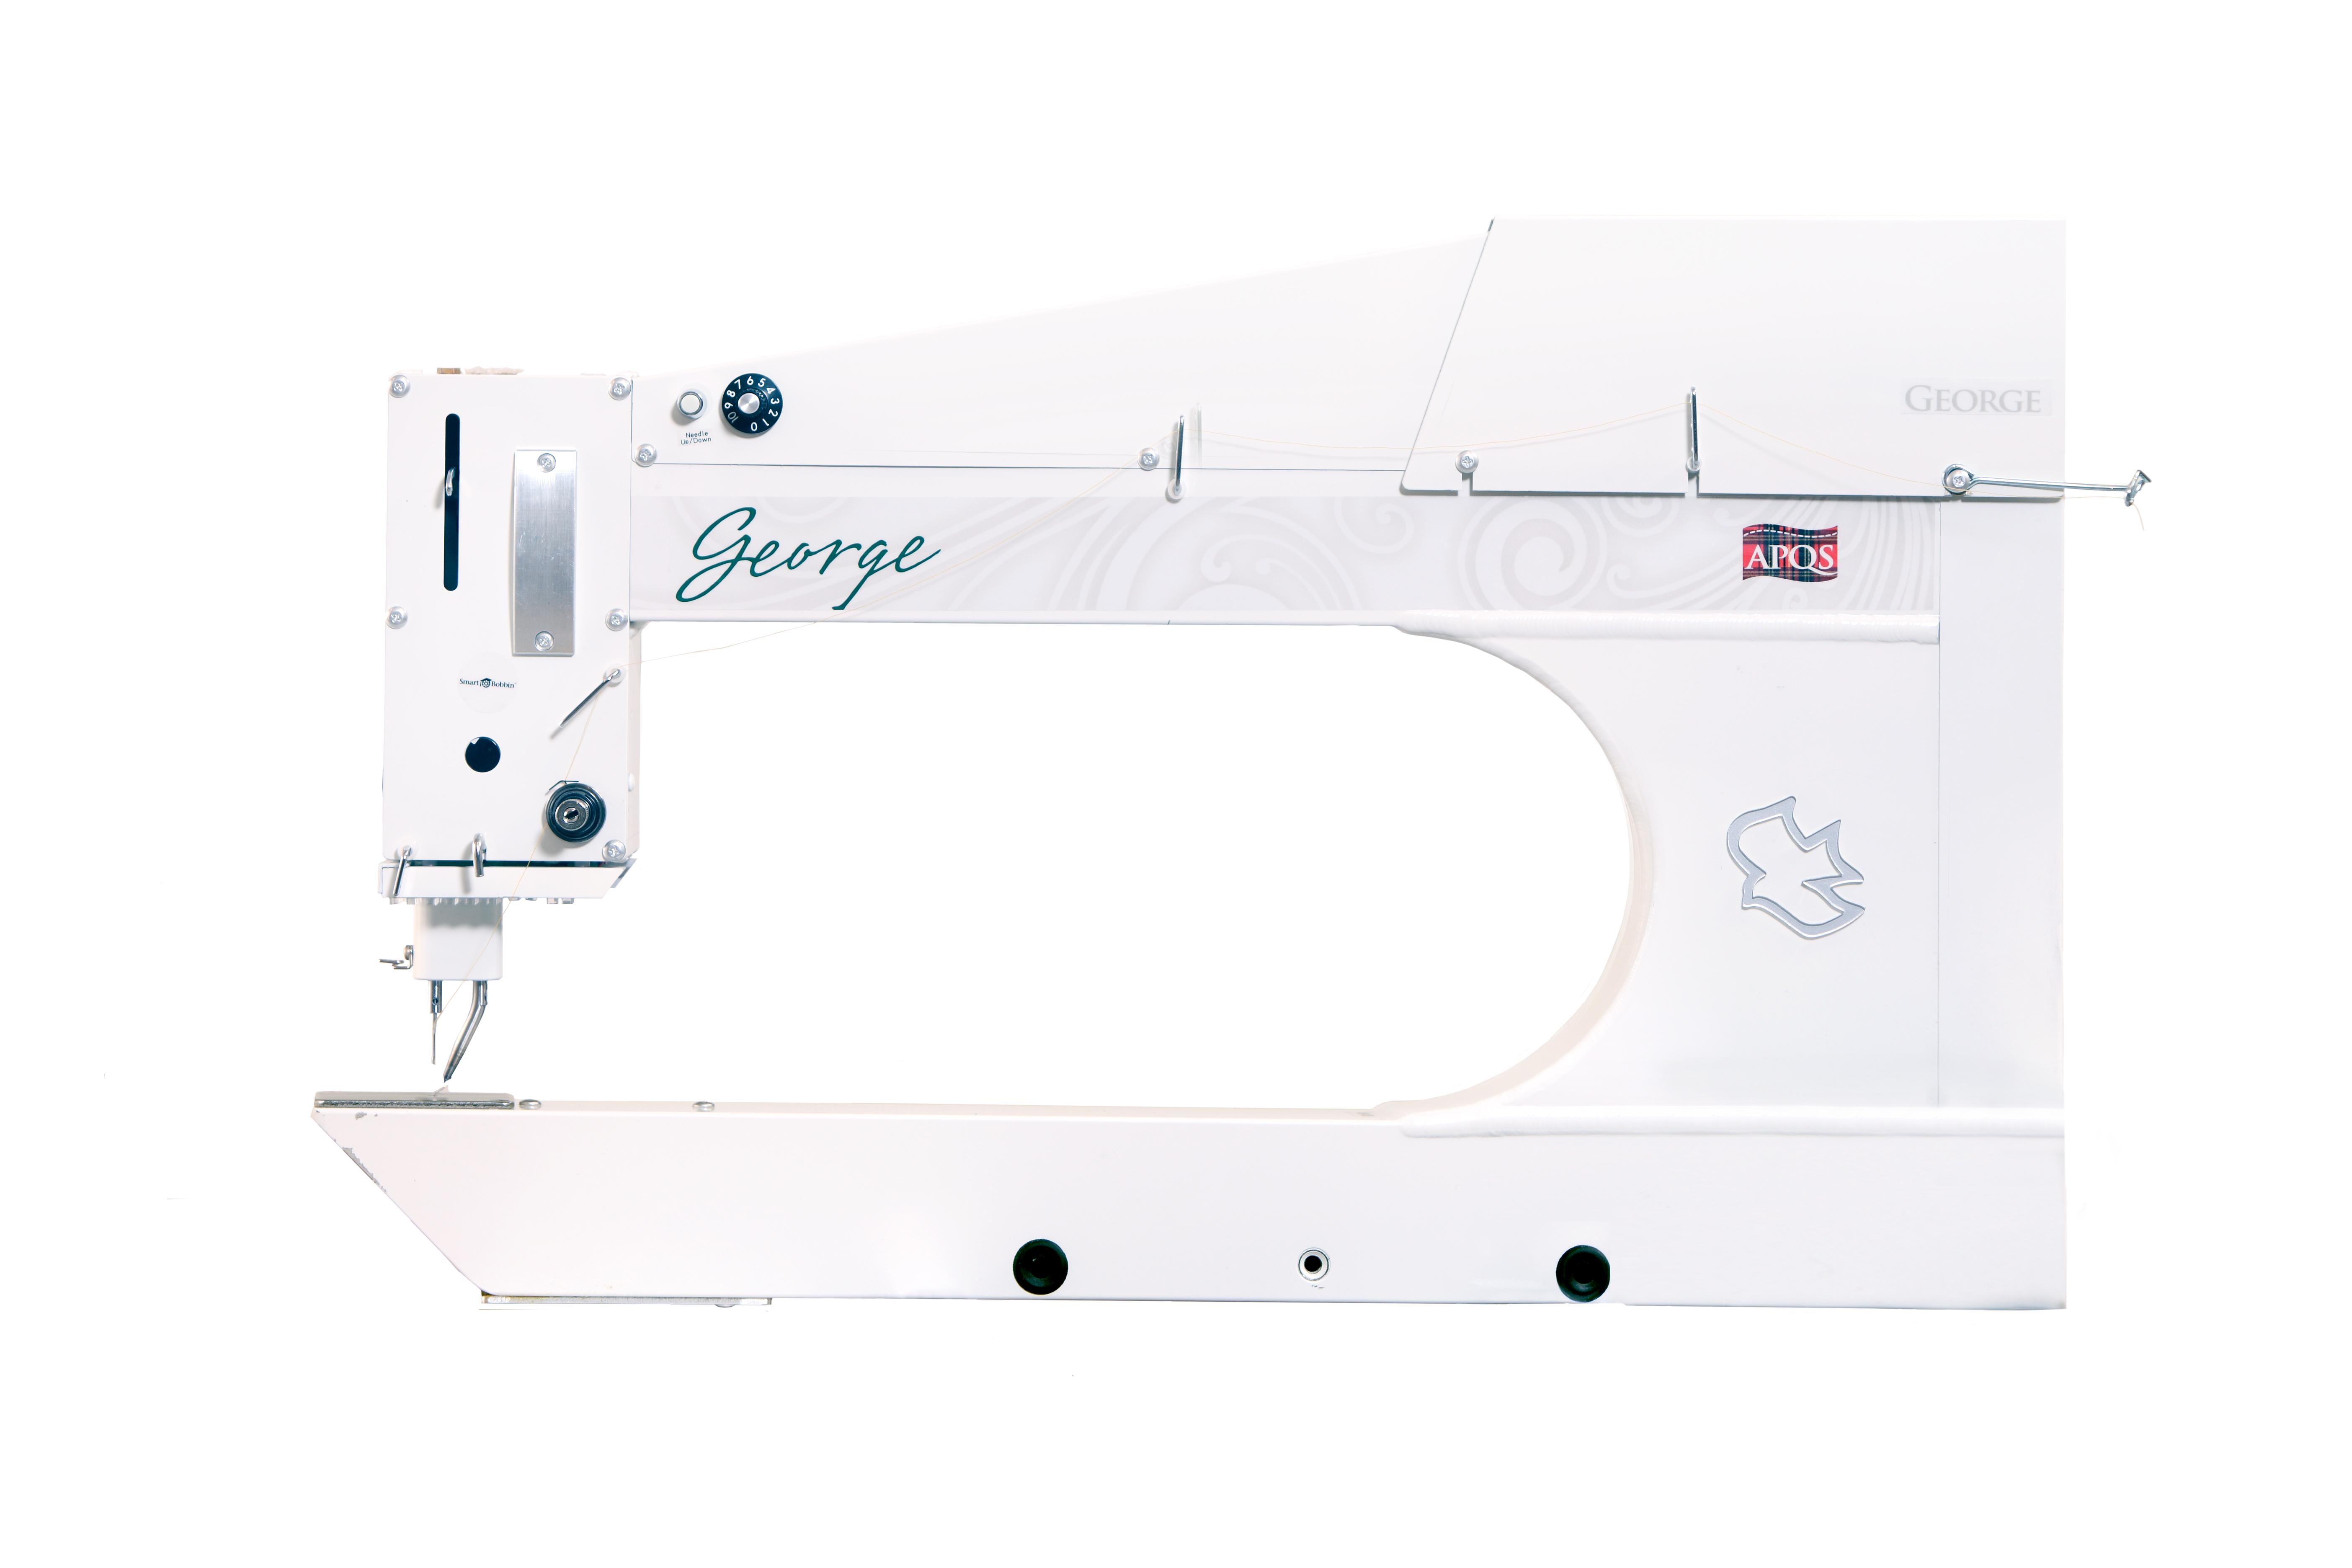 APQS Longarm Quilting Machines : george quilting machine - Adamdwight.com